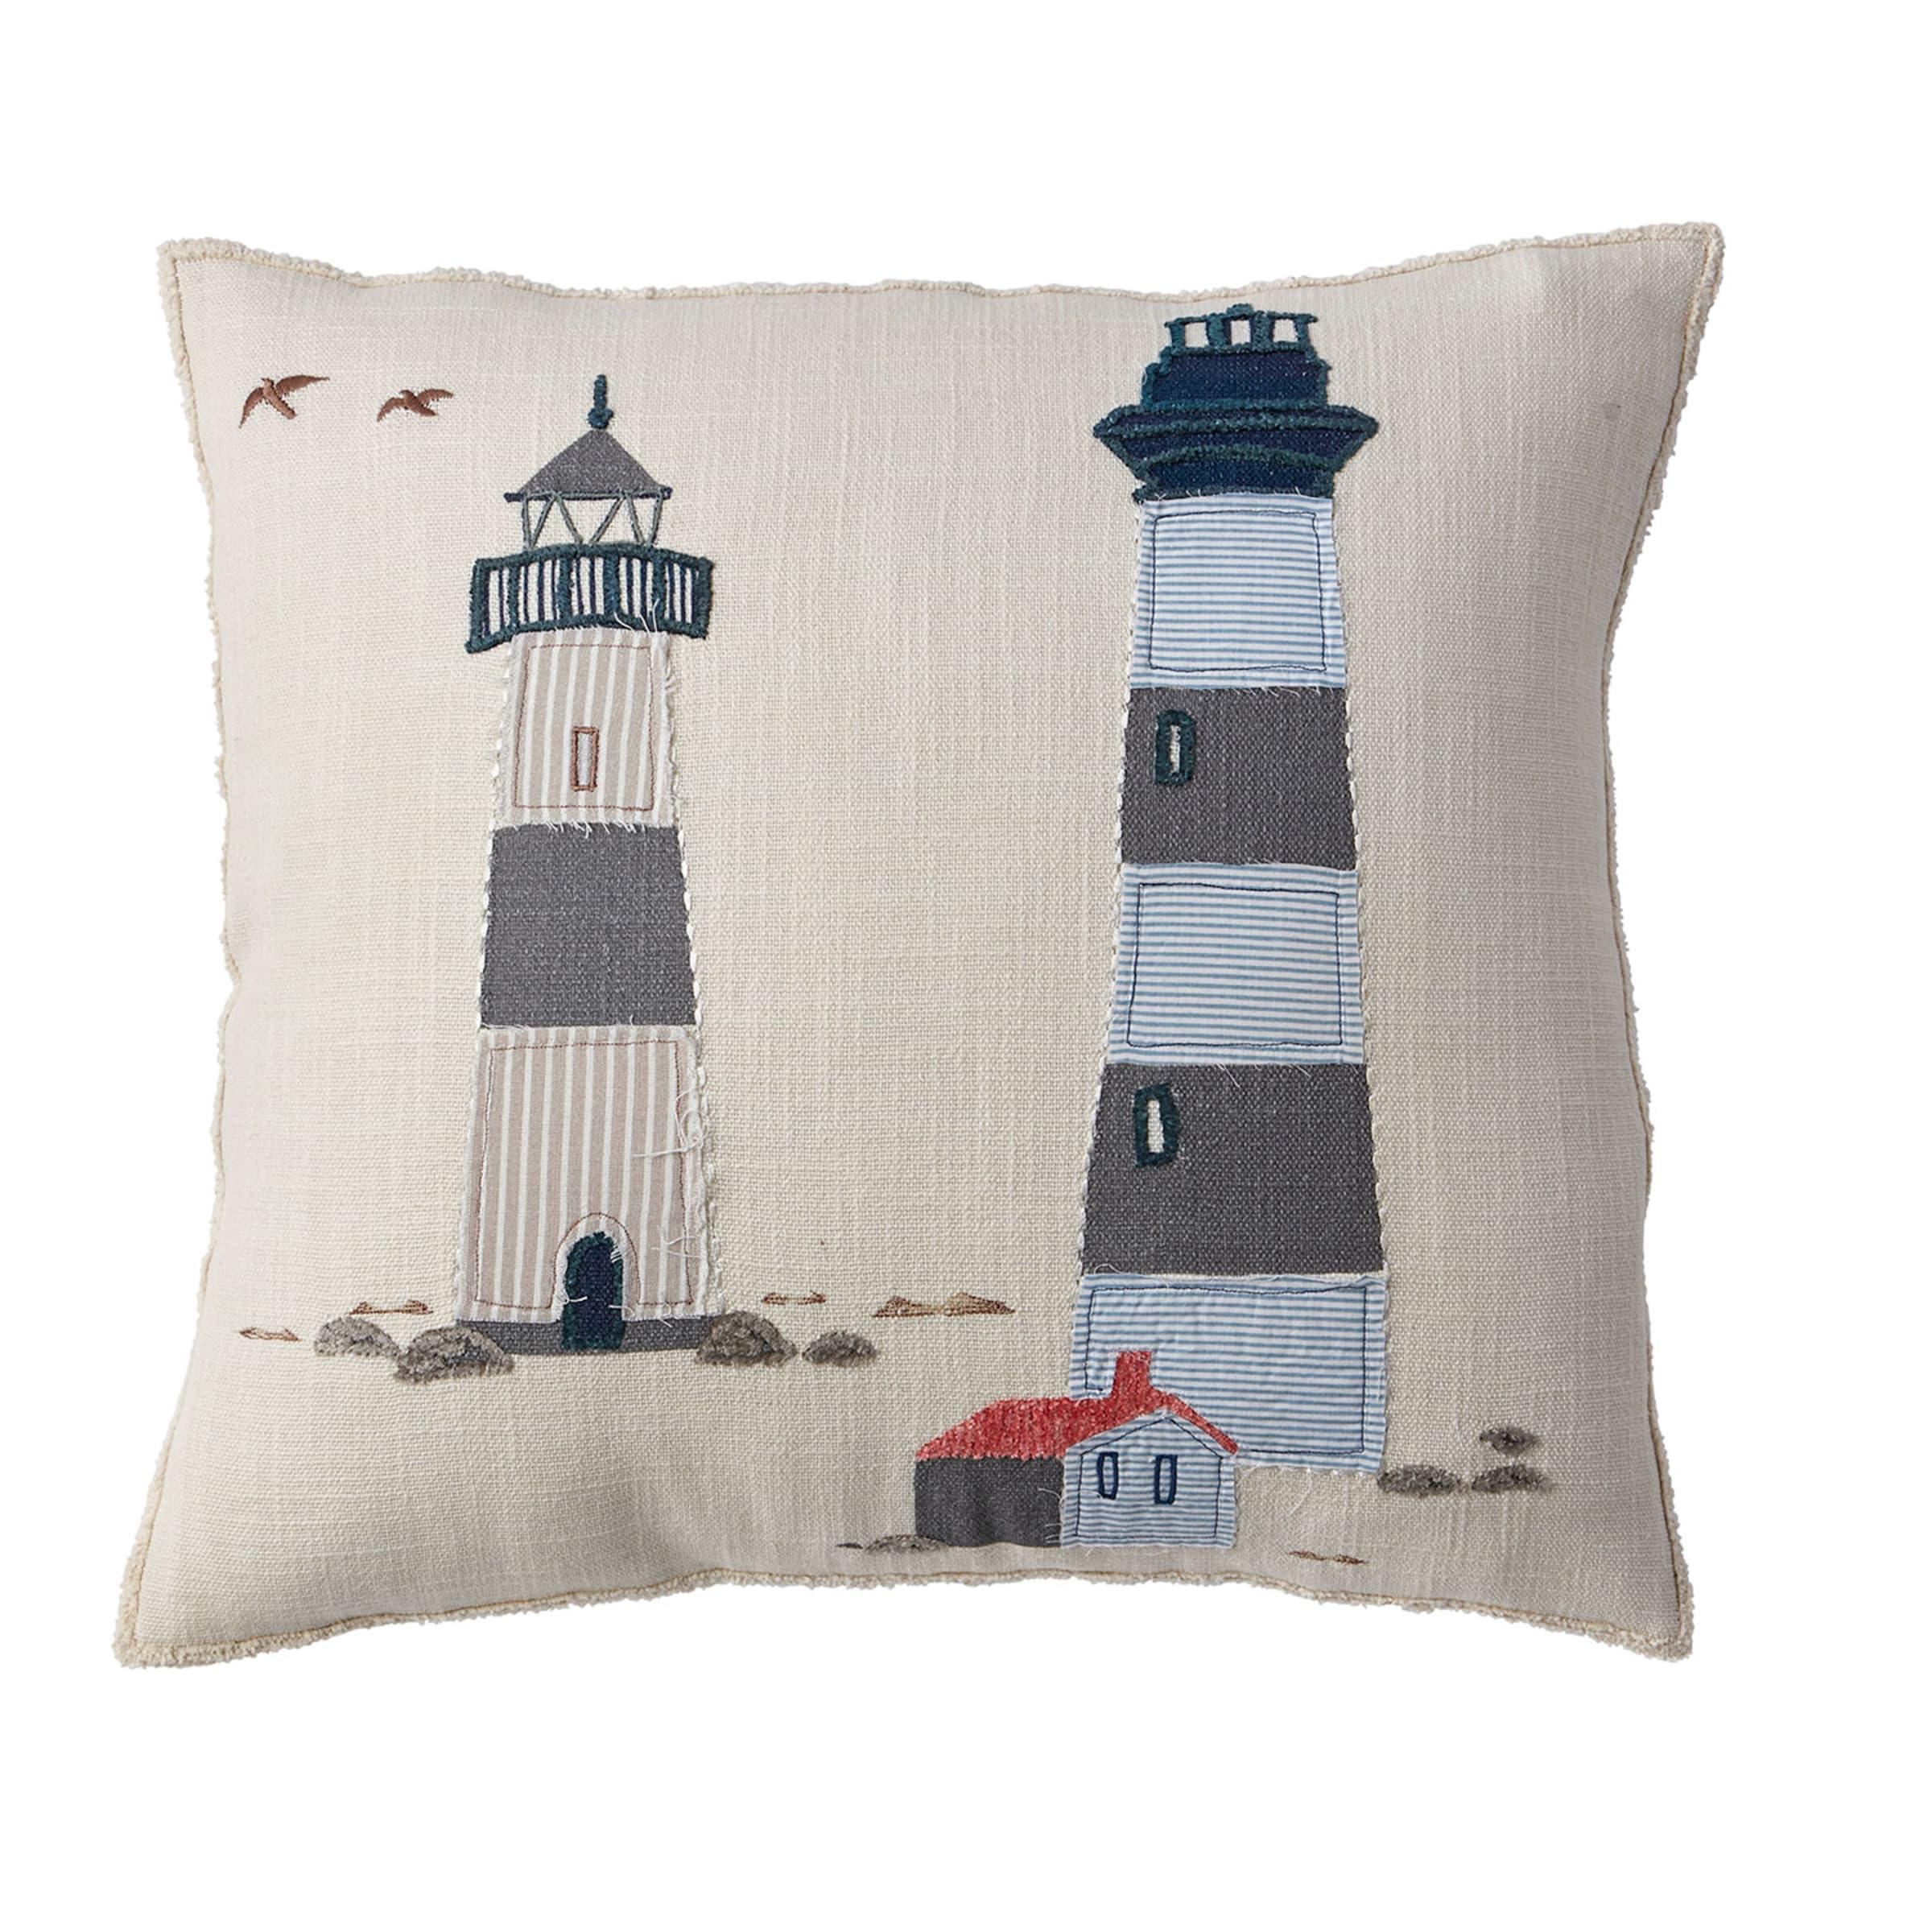 Summer Coastal Pillow Cover Lighthouse Design